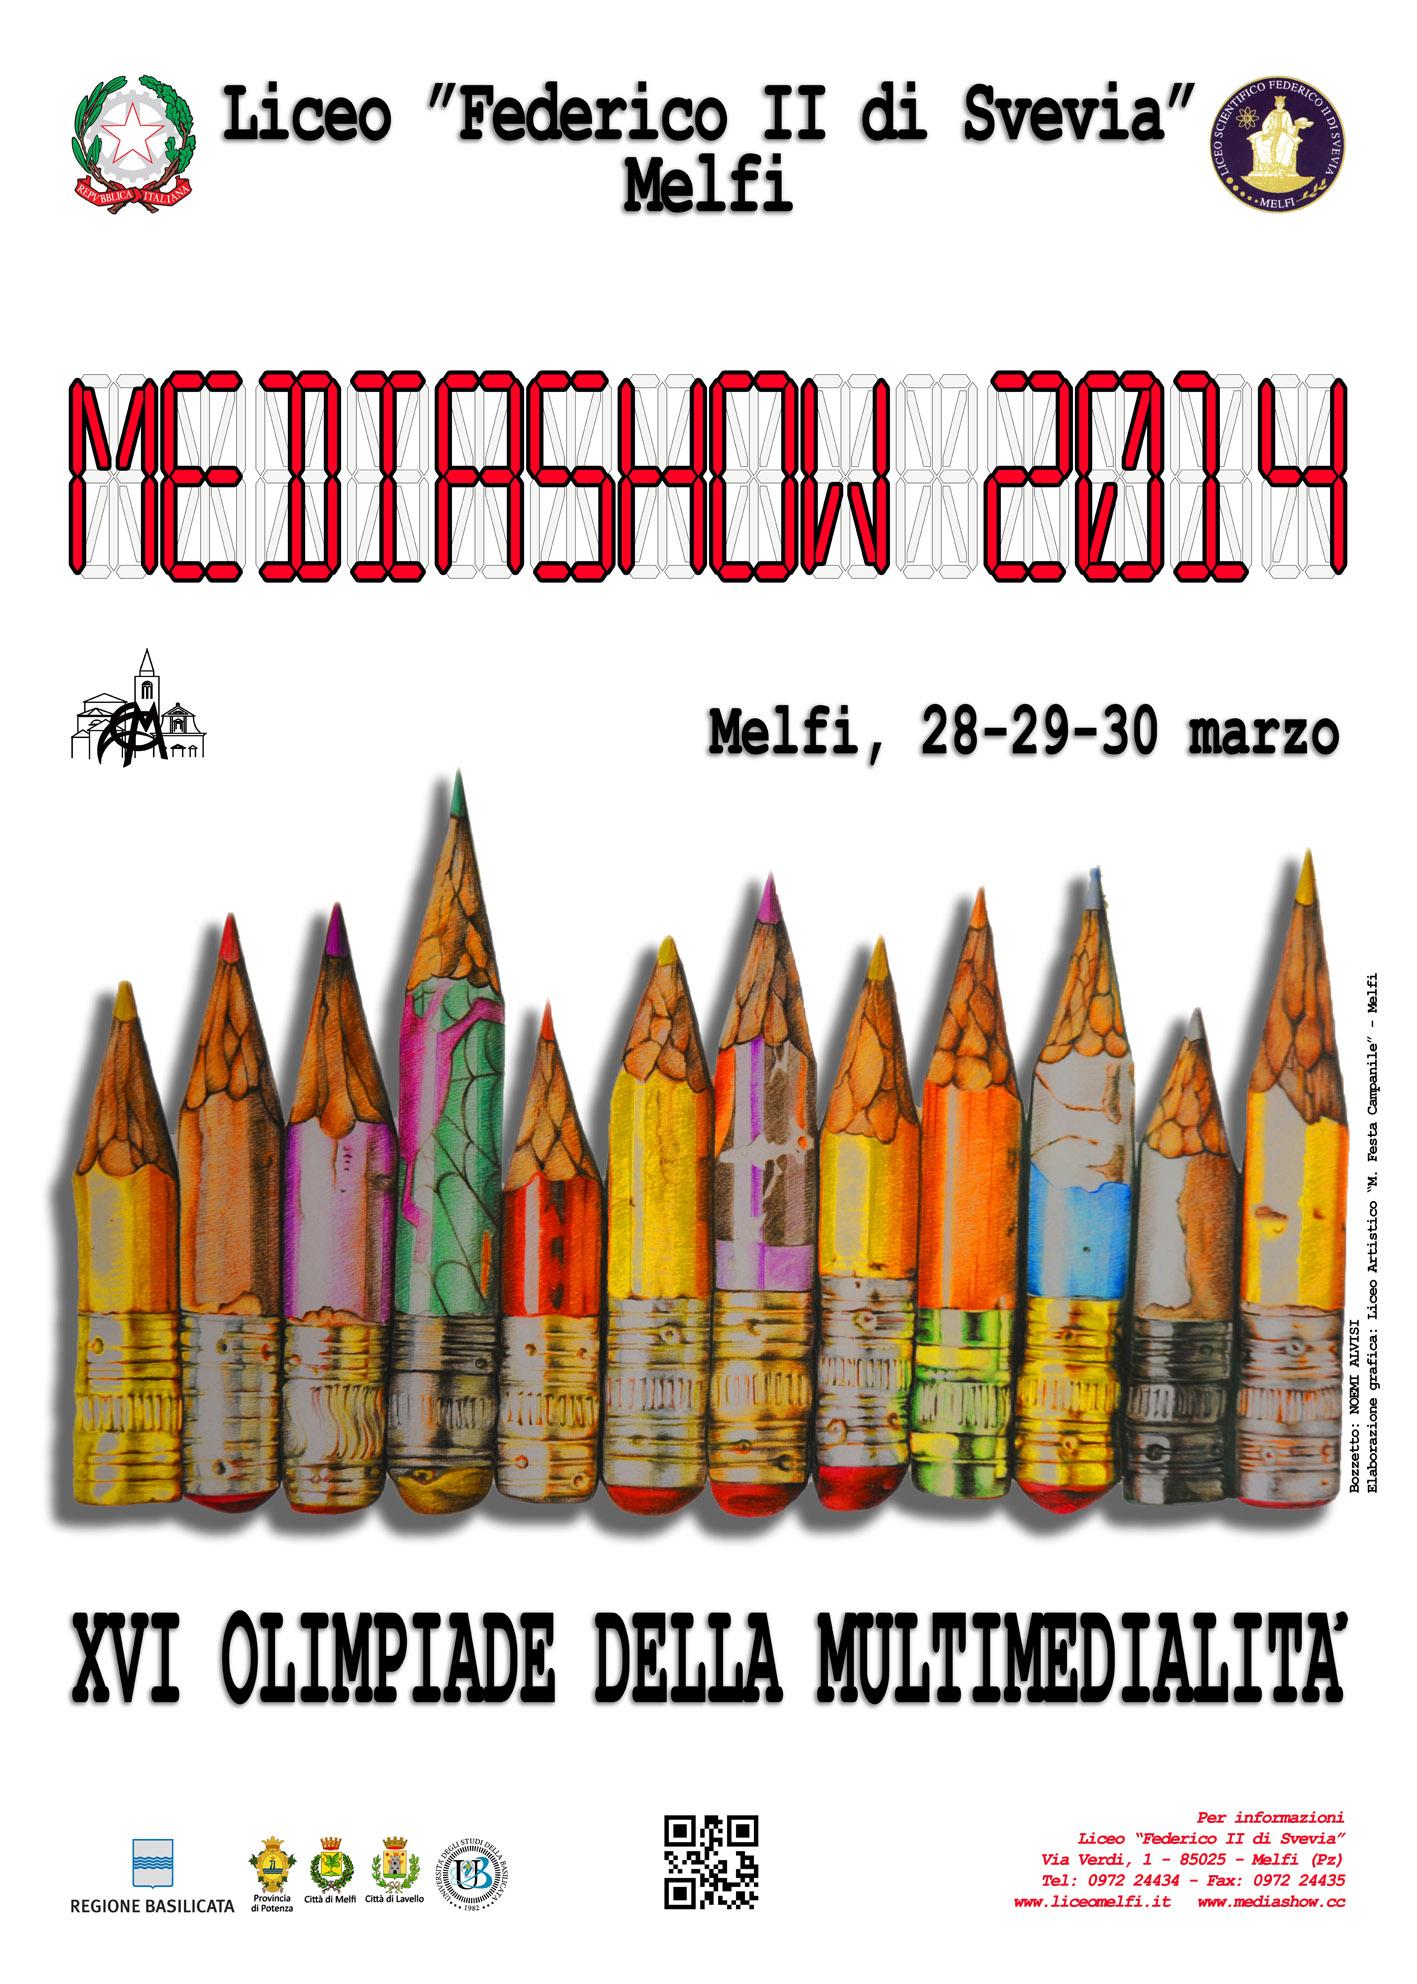 MEDIASHOW 2014